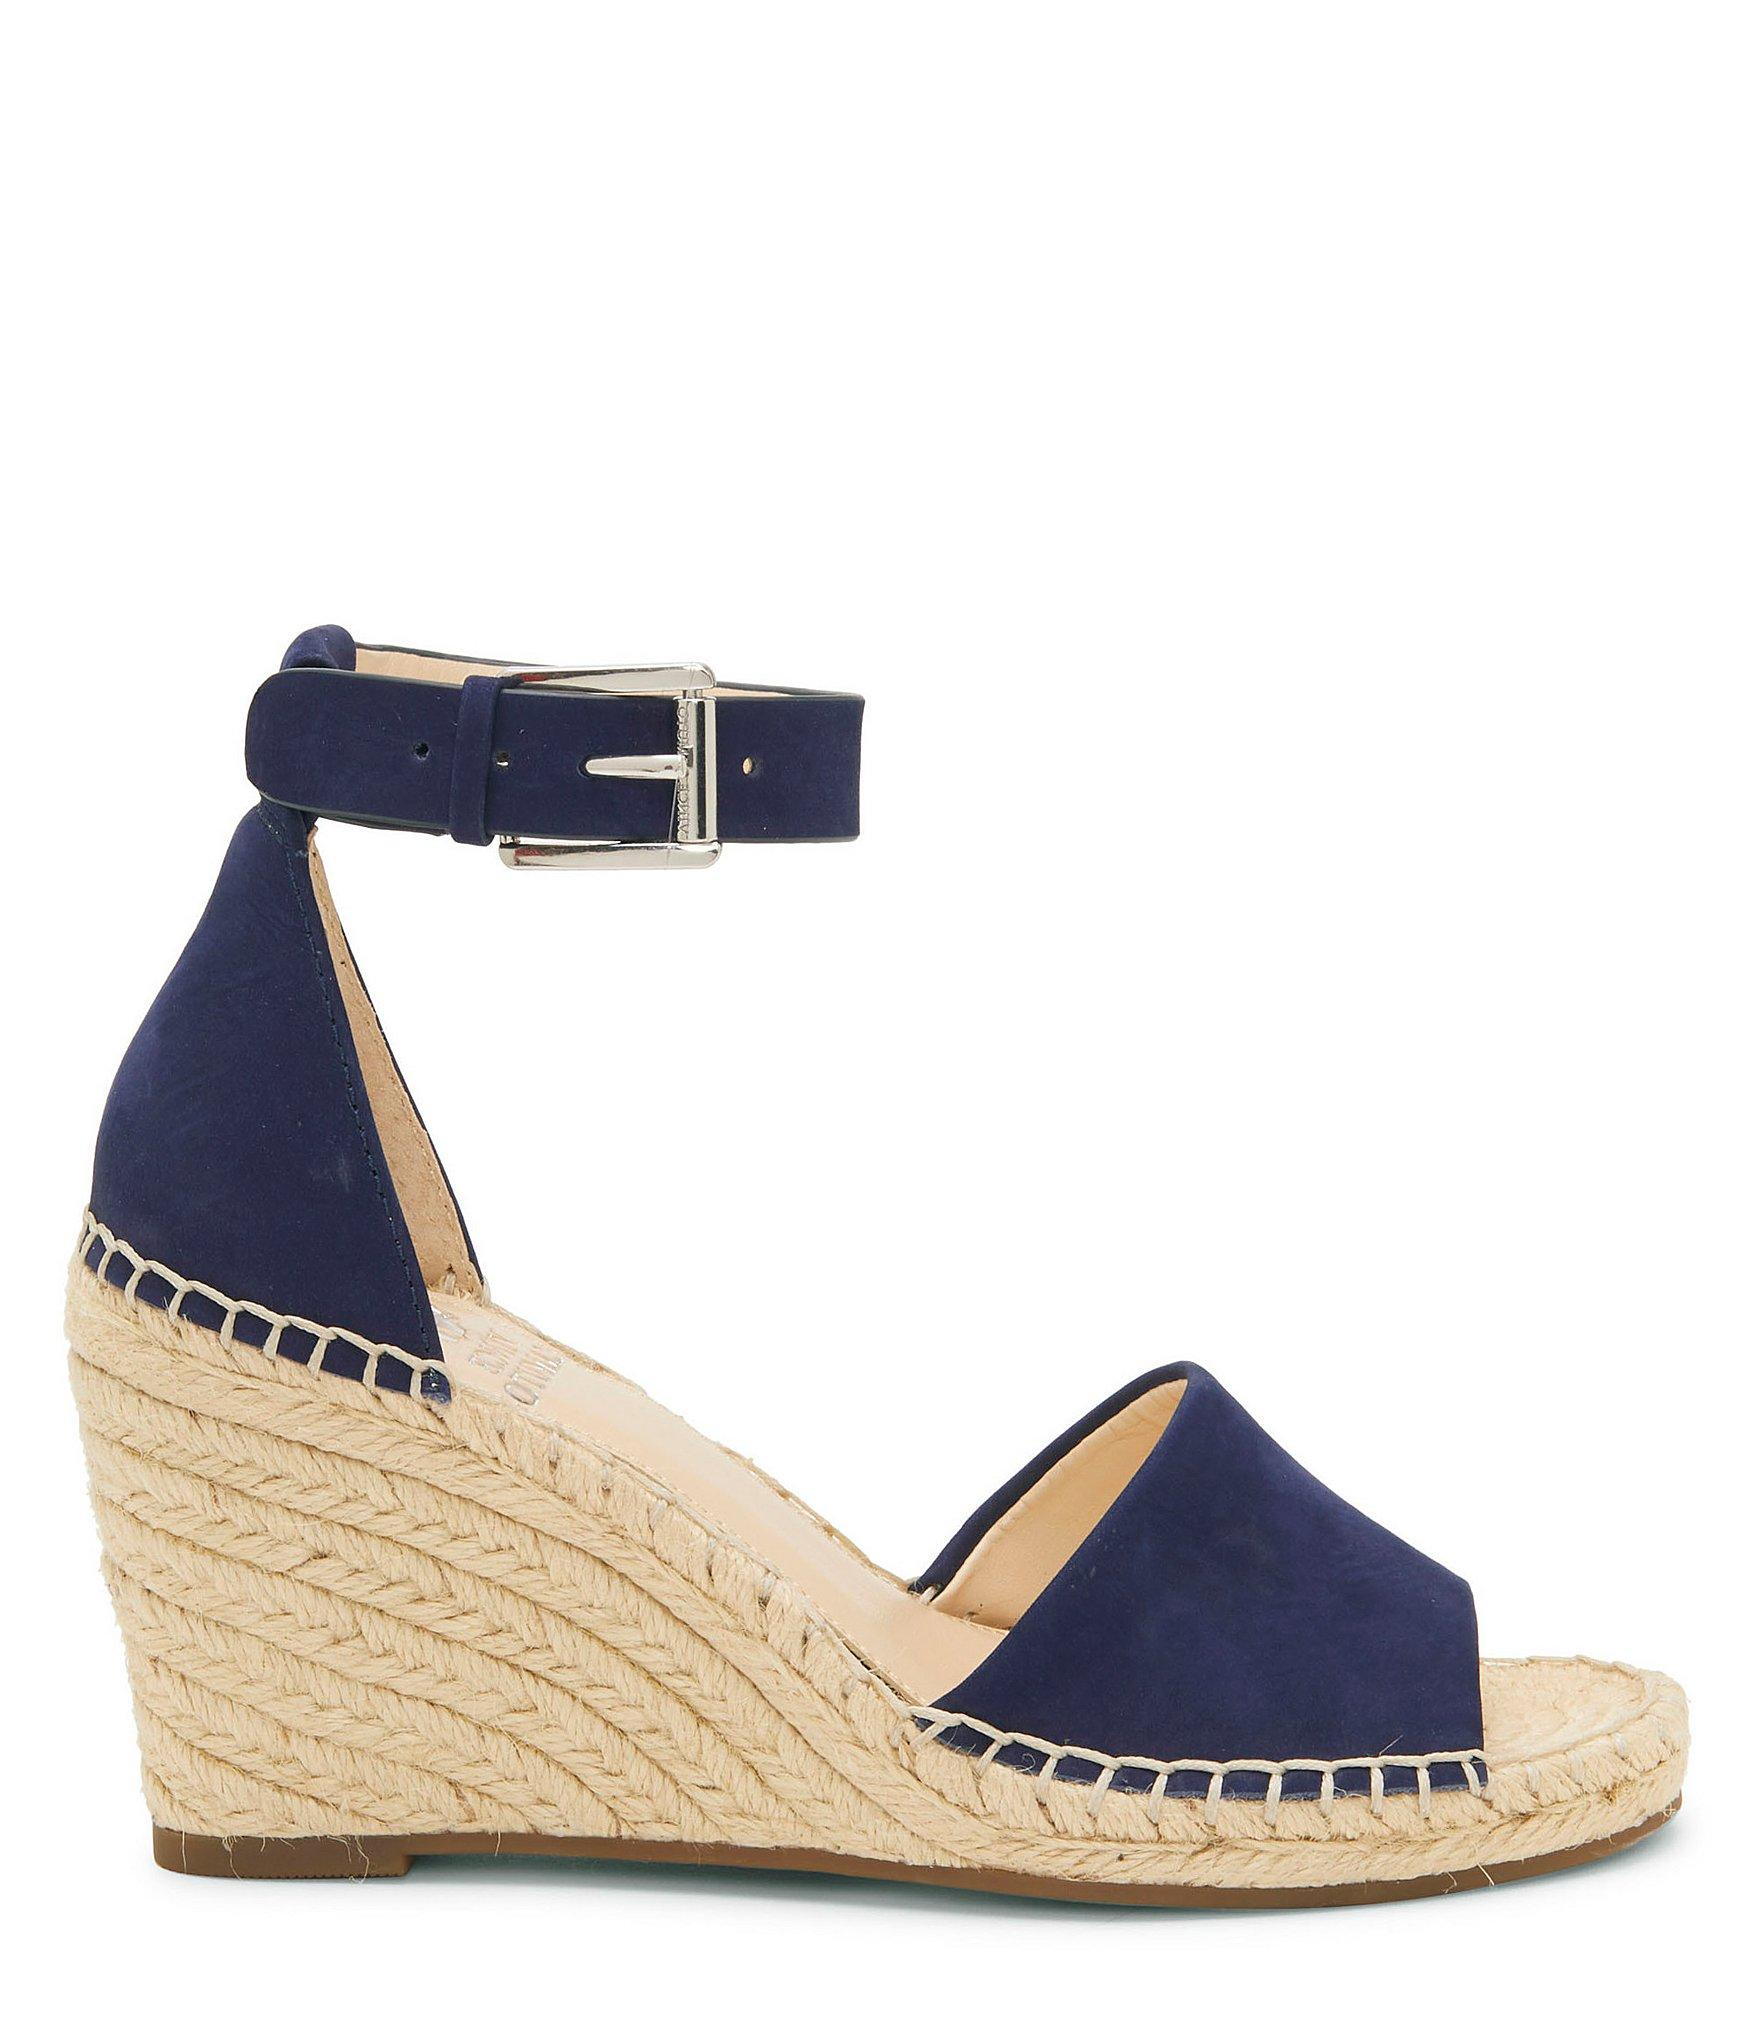 5247a51bcf ... Leera Nubuck Espadrille Wedge Sandals - Lyst. View fullscreen